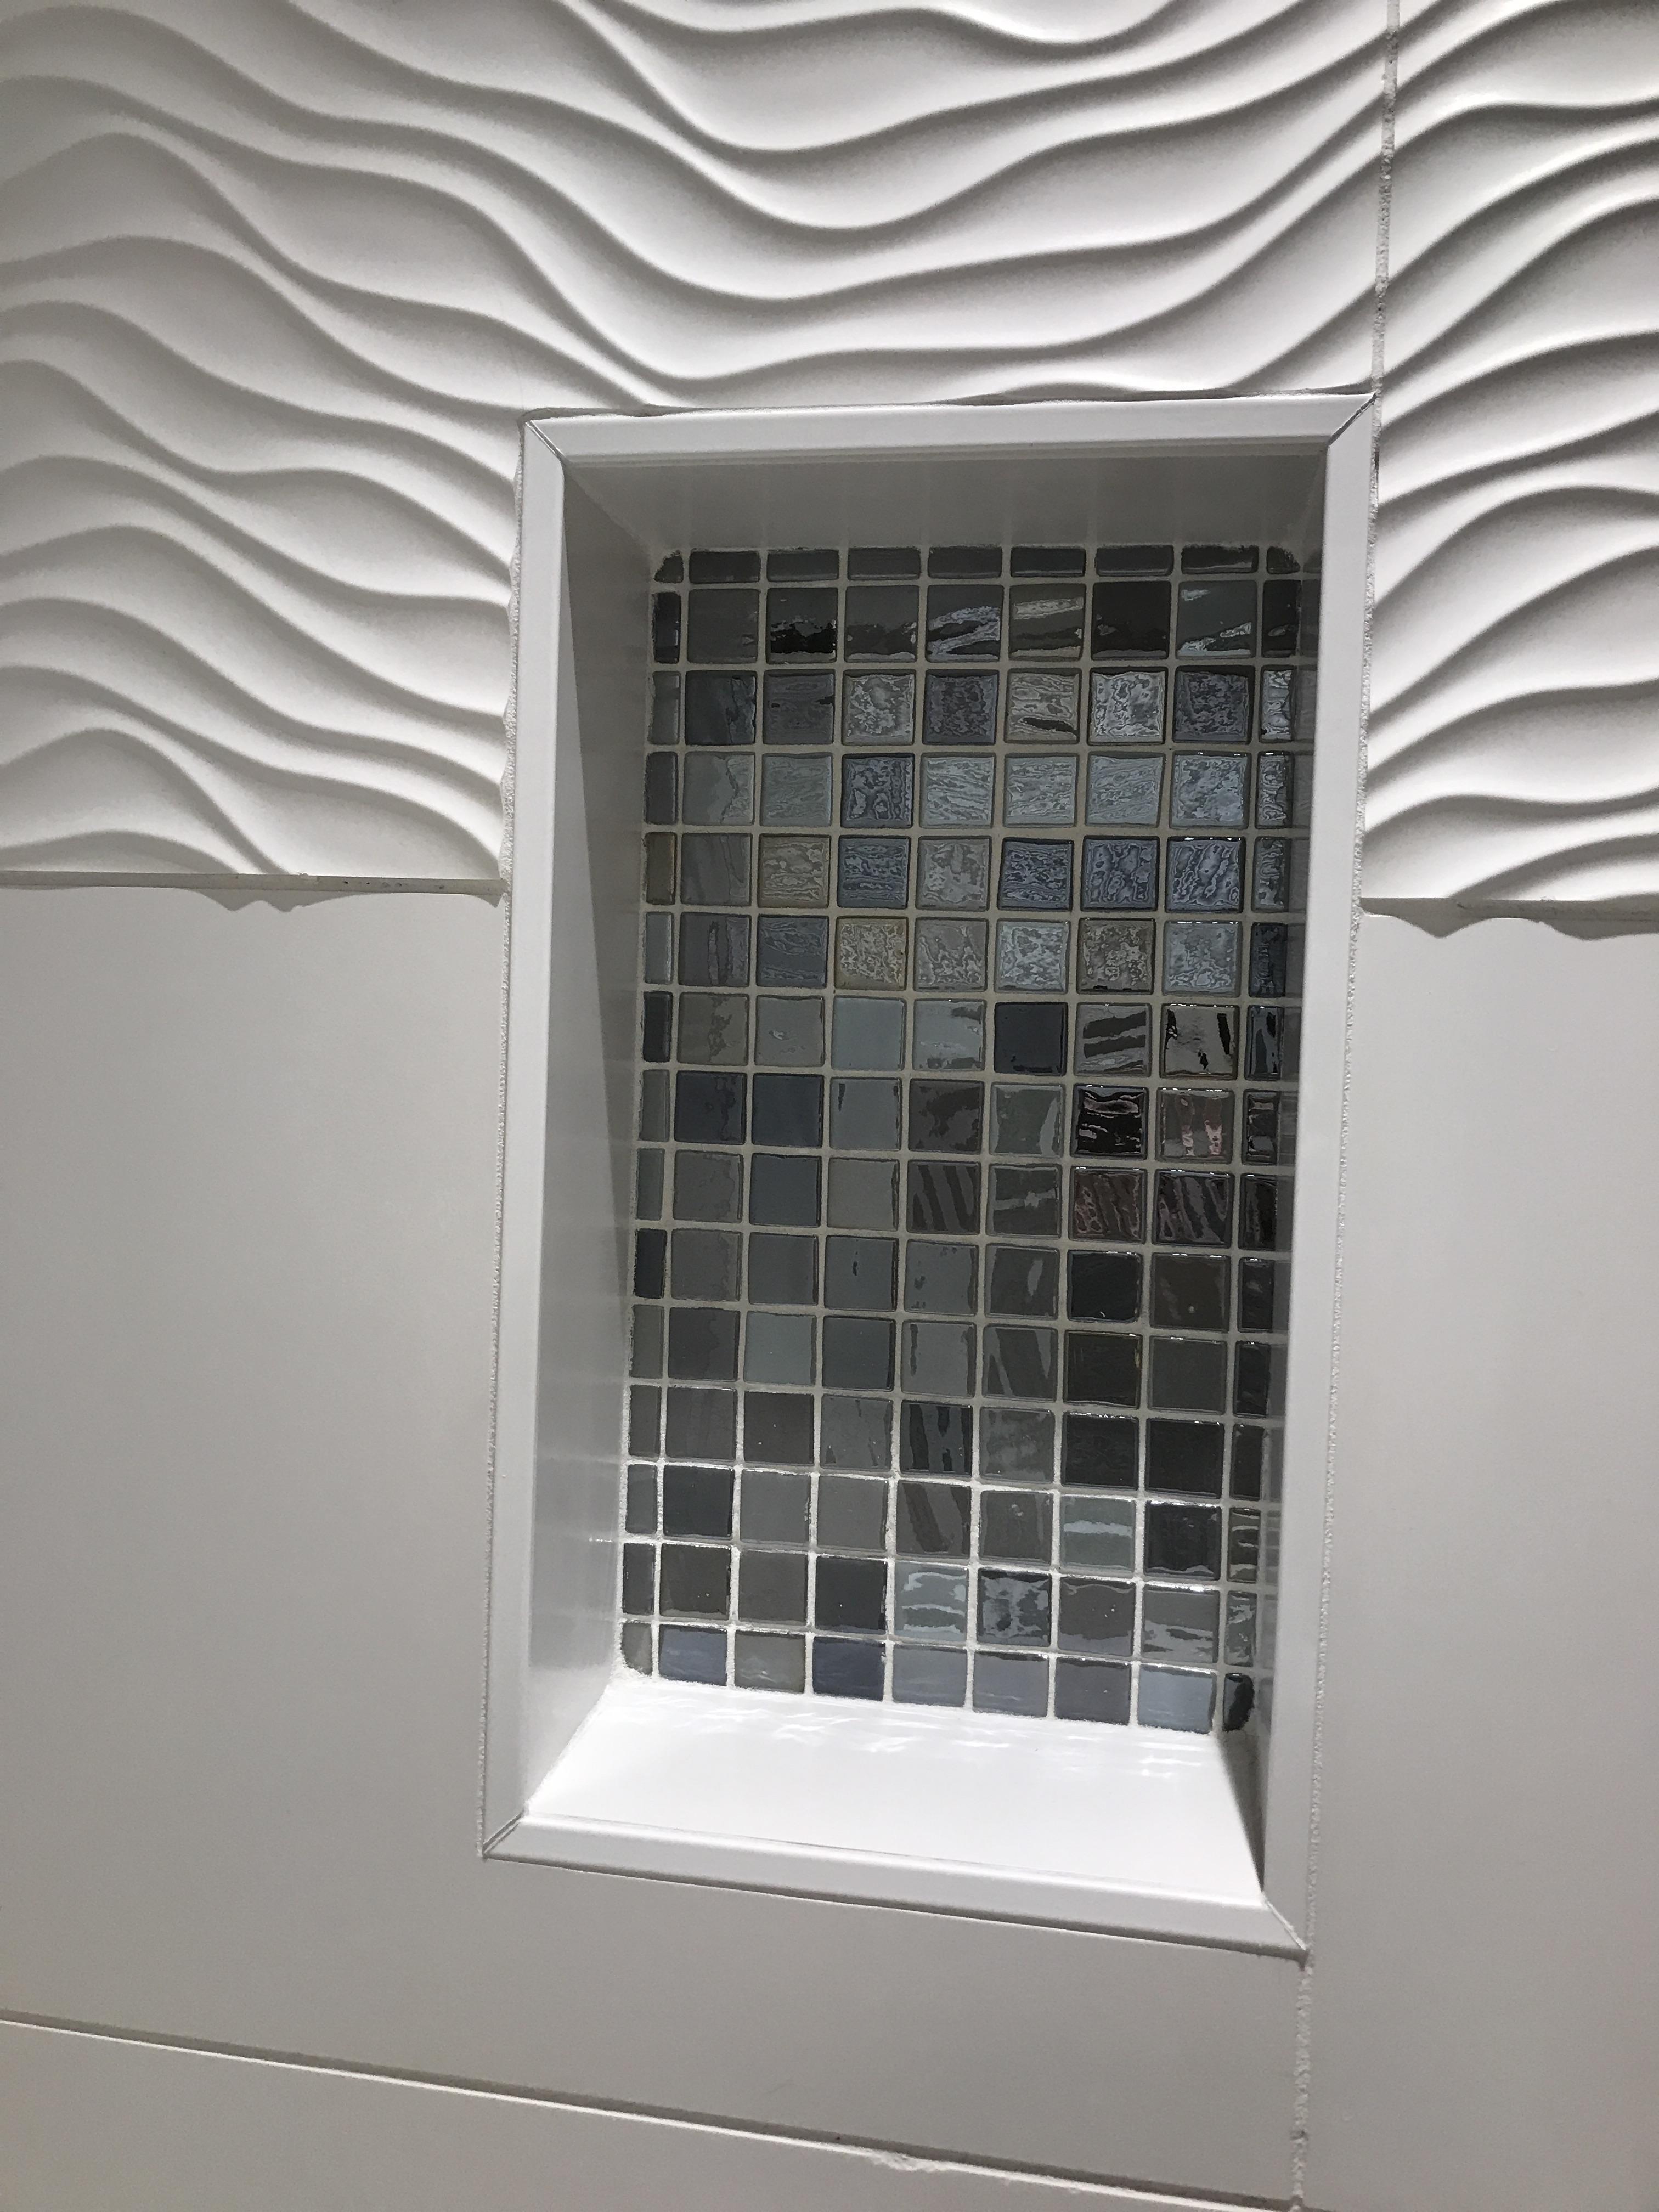 Help me out. Complete bathroom tiled.-84e6eac4-3243-4c2e-af60-639d7098d5f8_1528155392009.jpeg